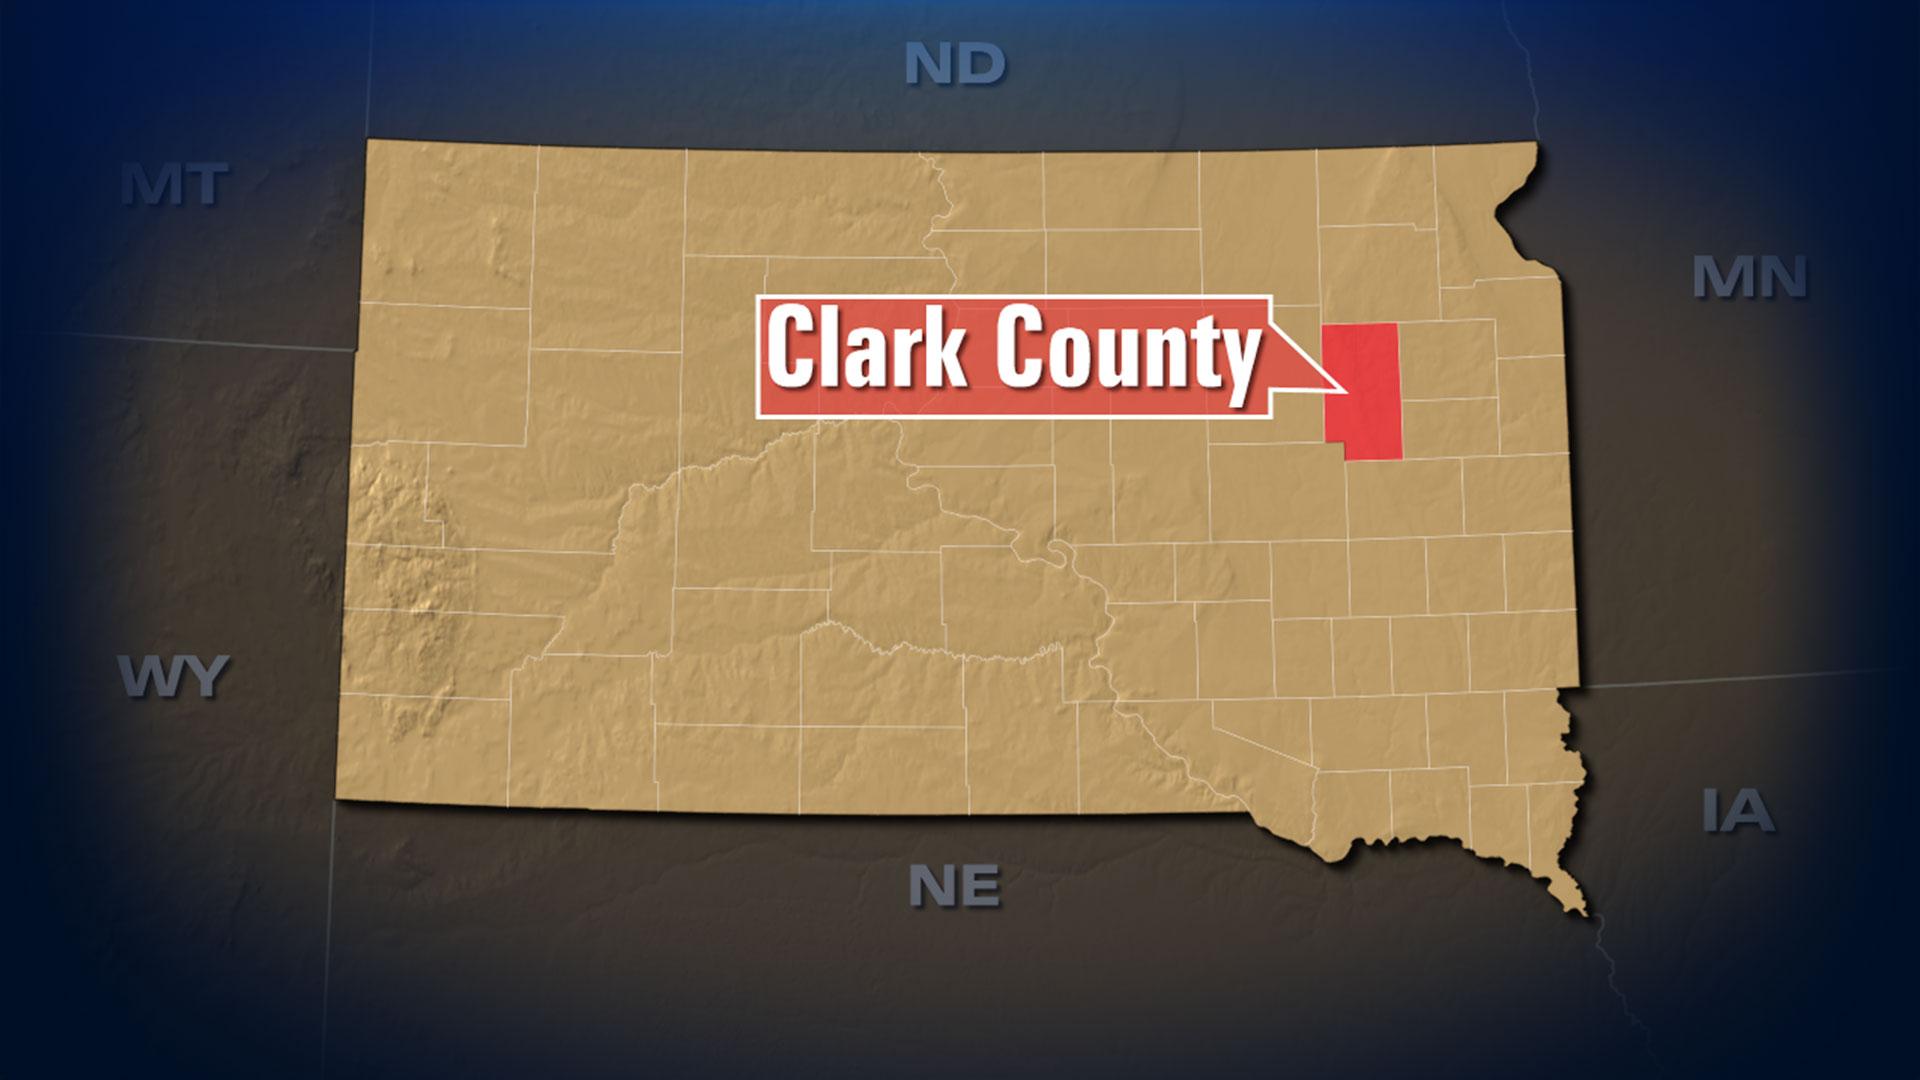 KELO Clark County